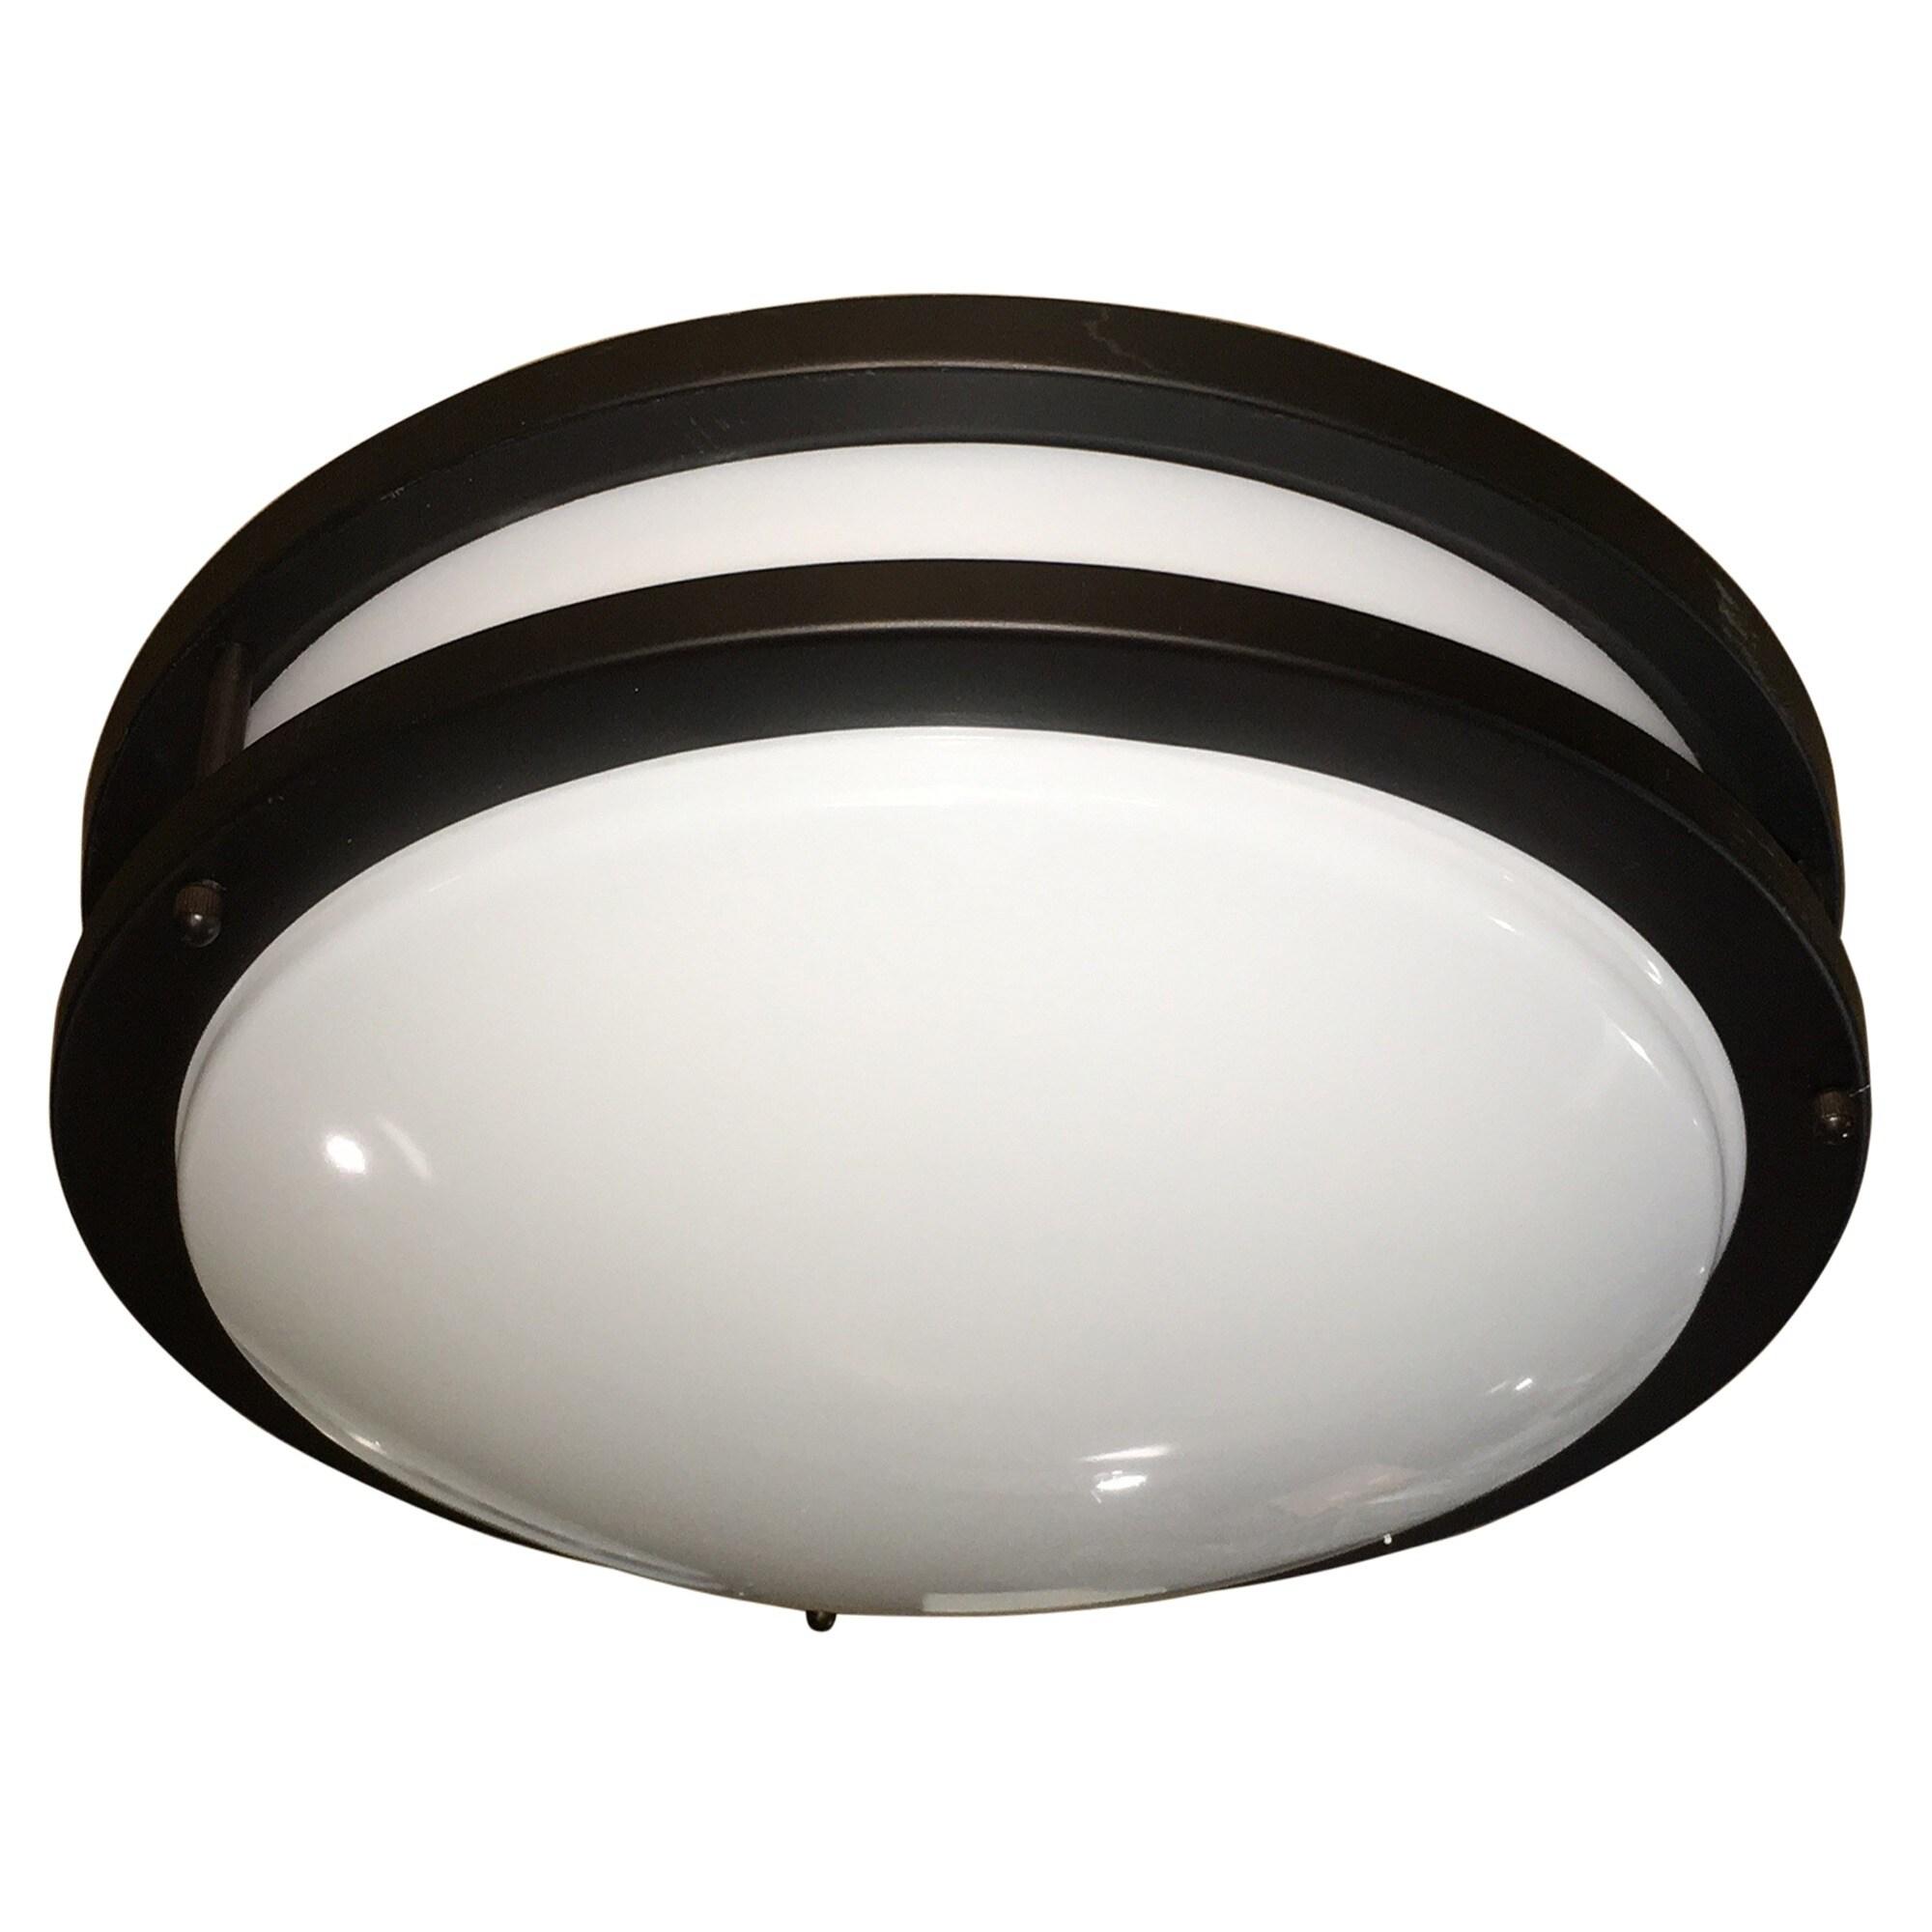 Y decor euro decorative oil rubbed bronze fluorescent ceiling light fixture